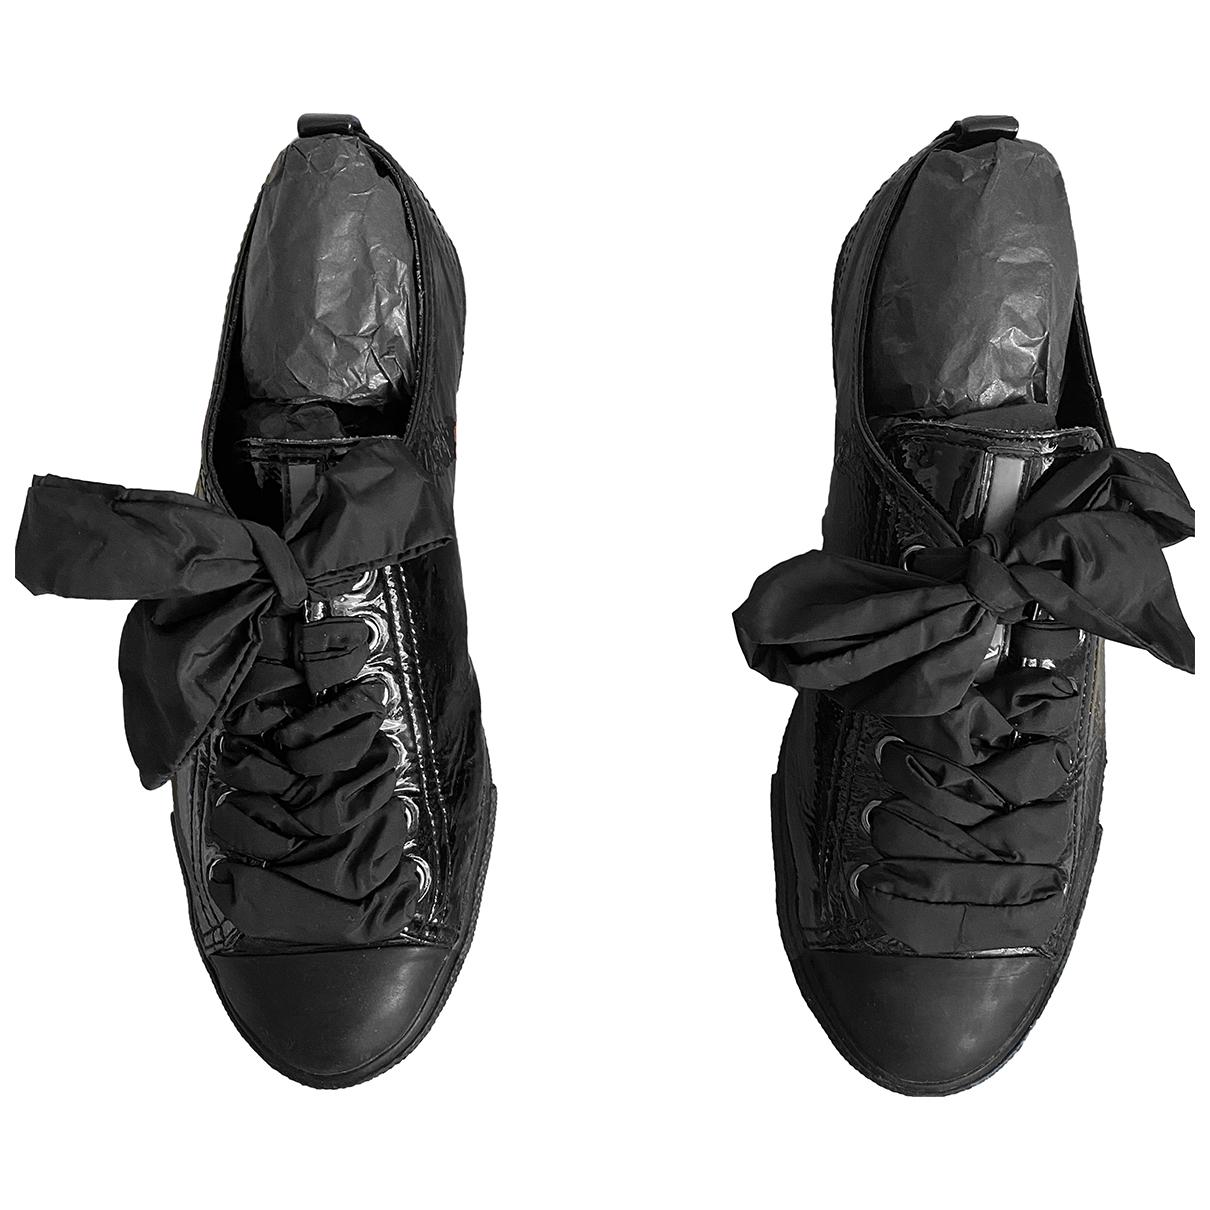 Prada \N Black Leather Trainers for Women 38.5 IT